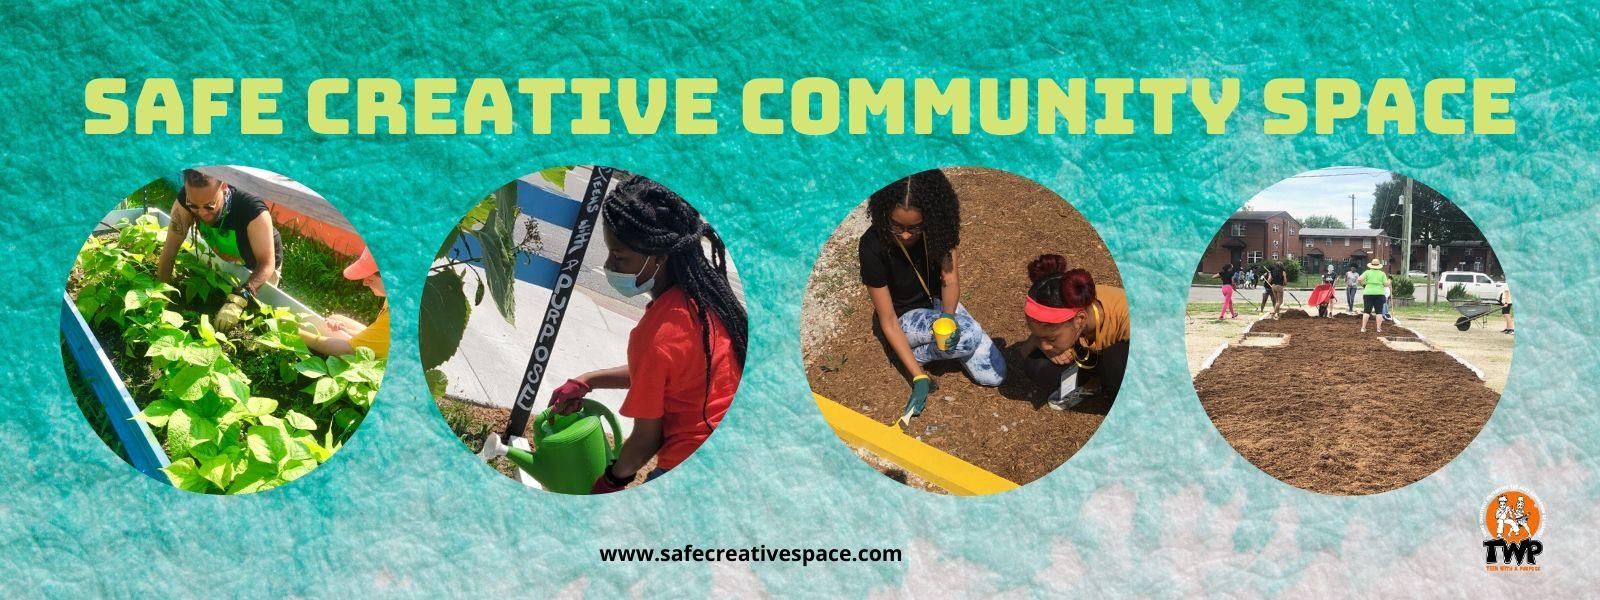 Safe Creative Community Space